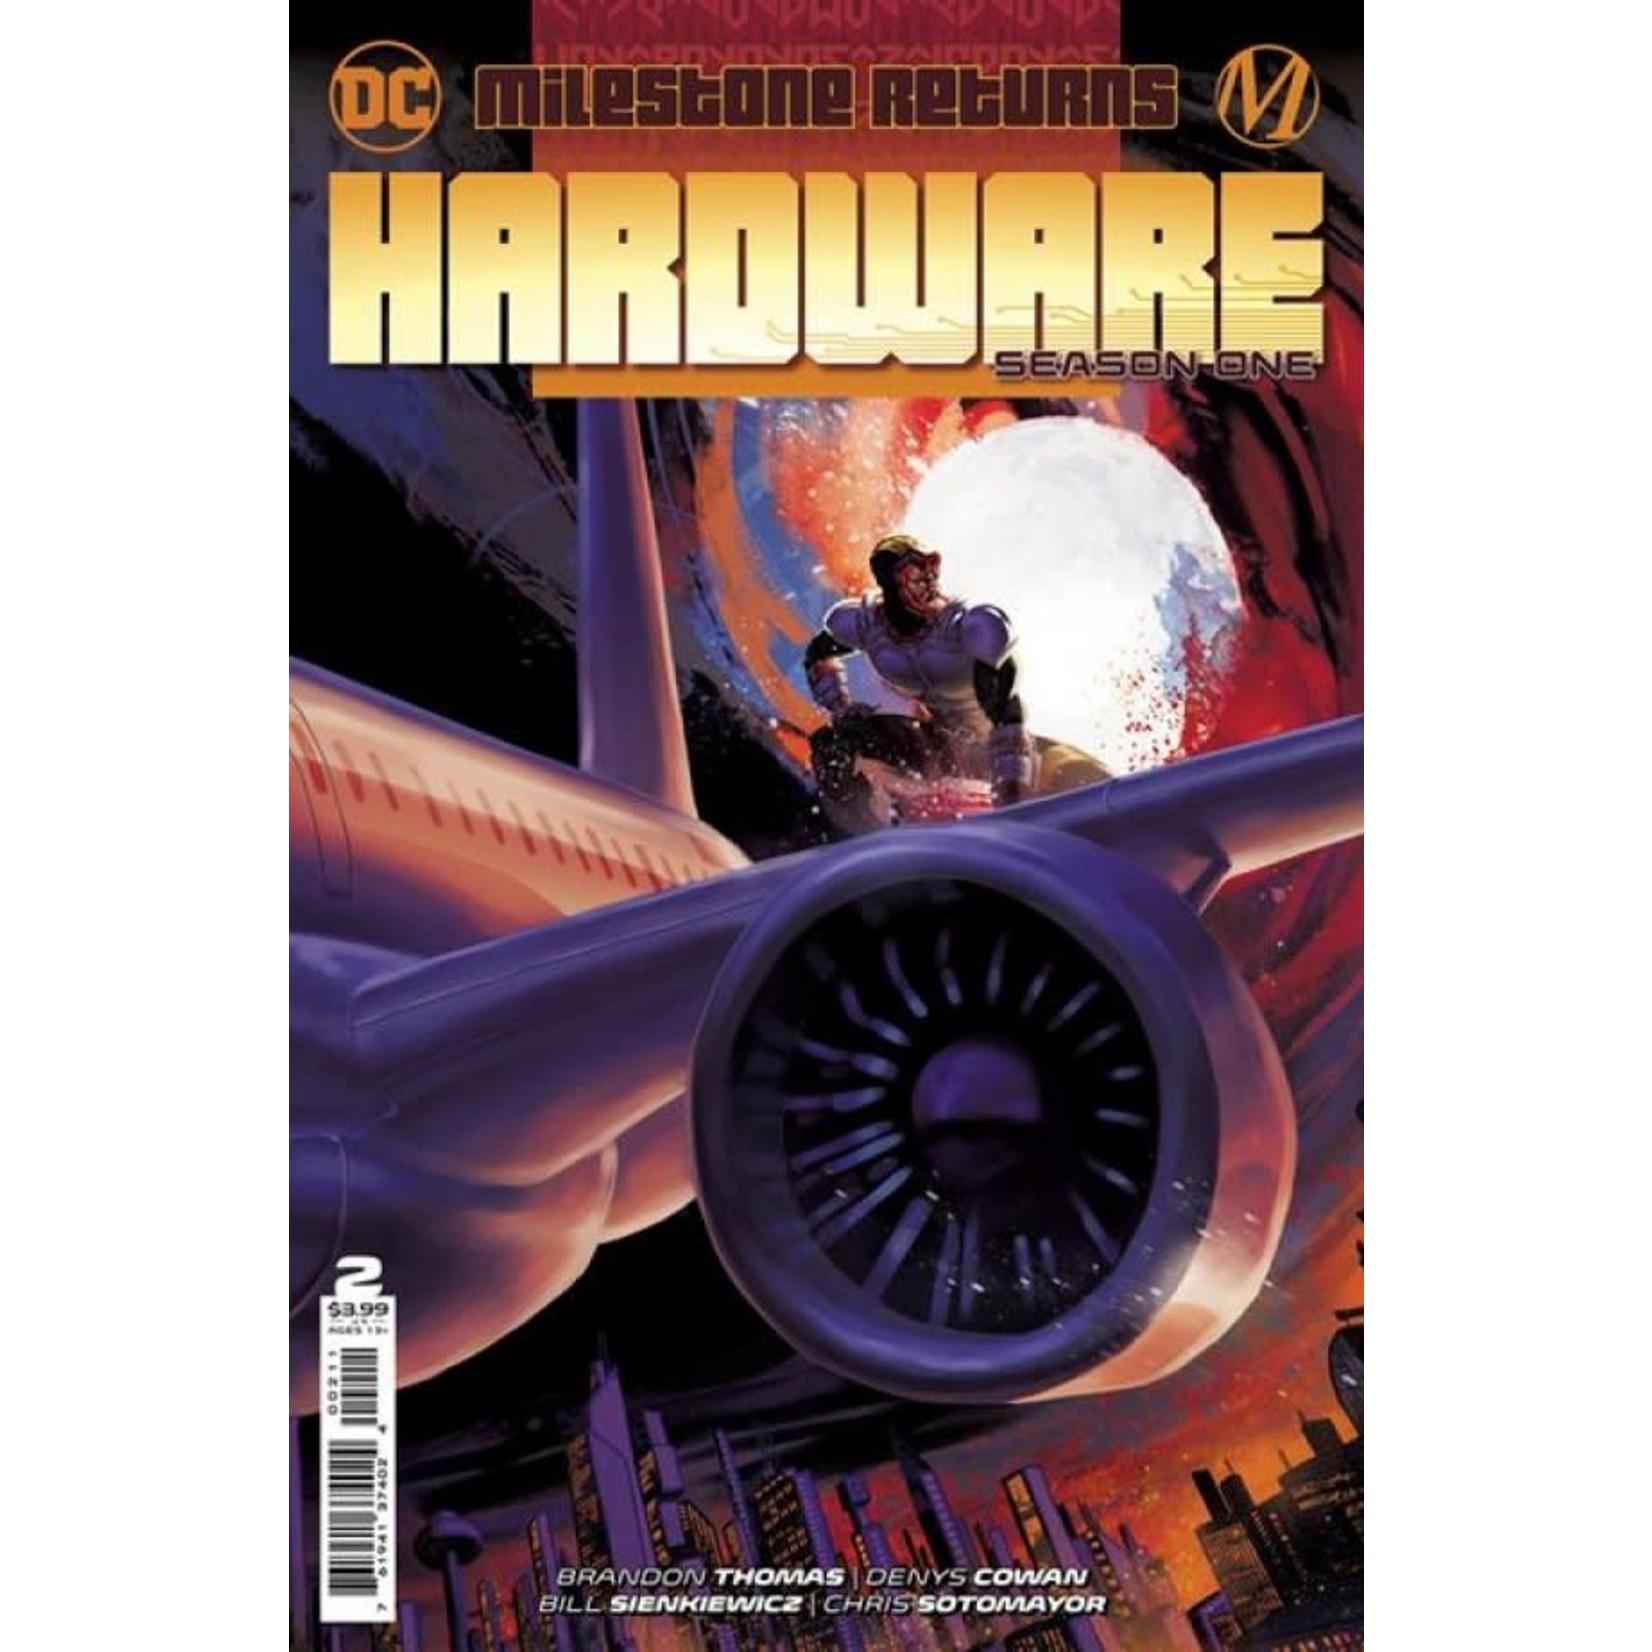 DC Comics Hardware: Season One #2